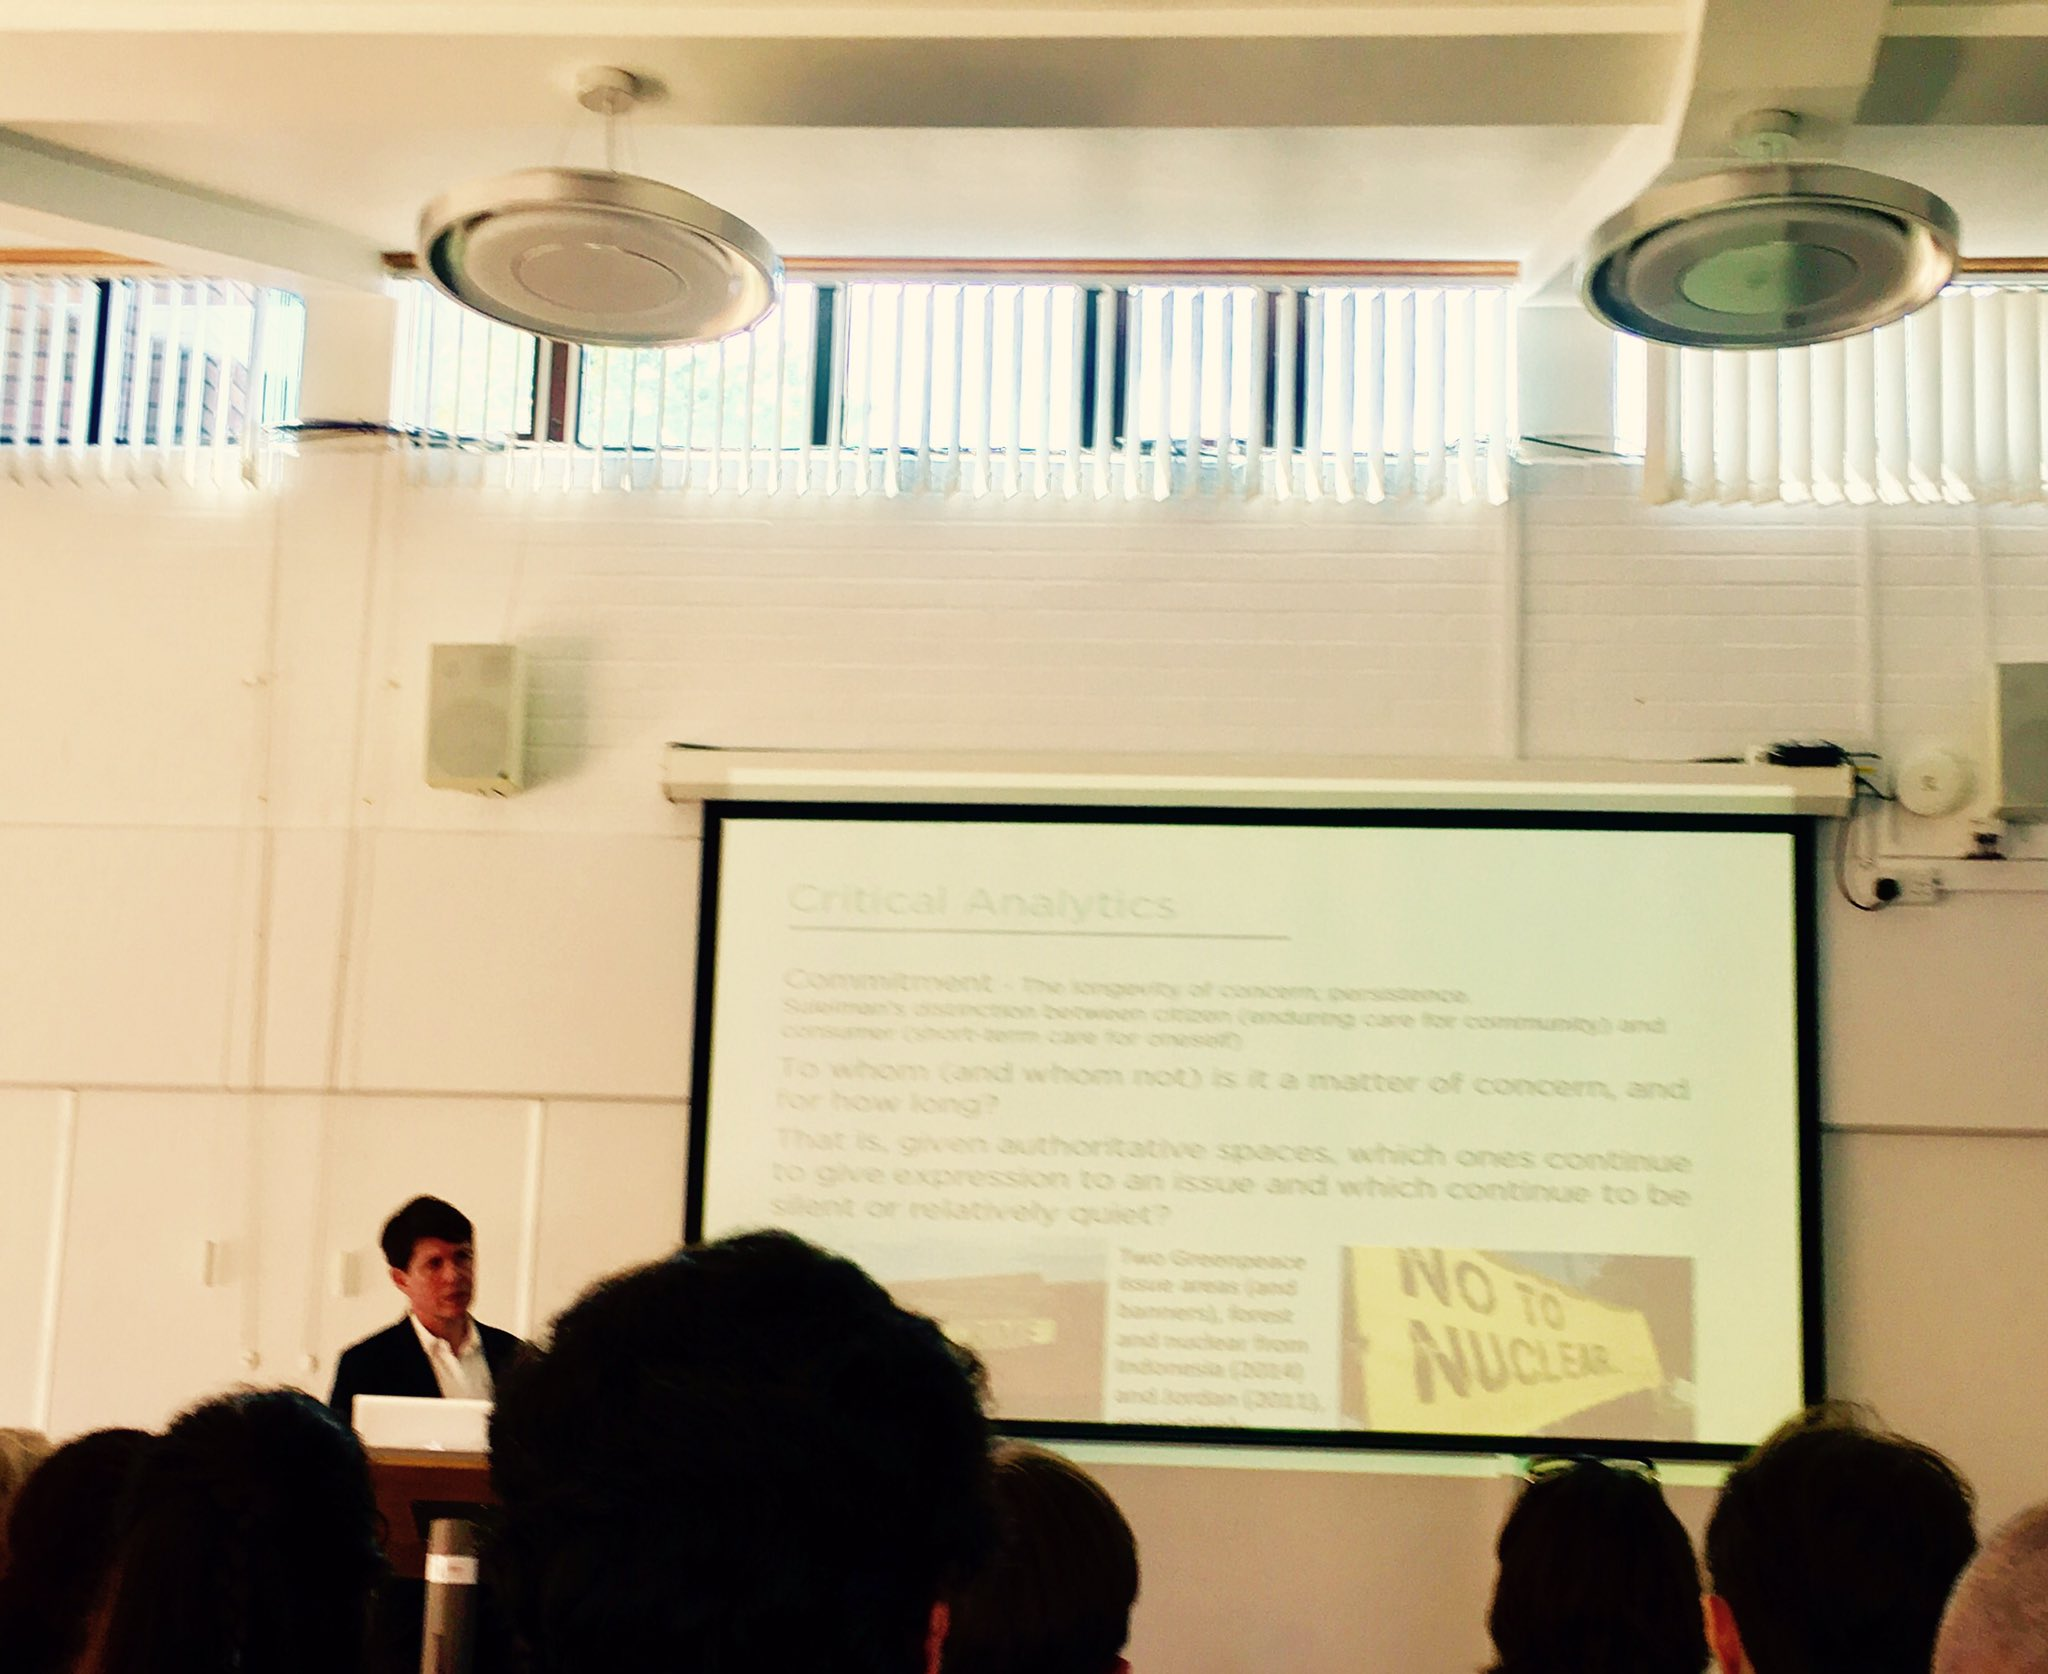 Richard Rogers keynote kicks off the conference on digital methods #RMDigital @UniOfSurrey https://t.co/IXA6yoHXA2